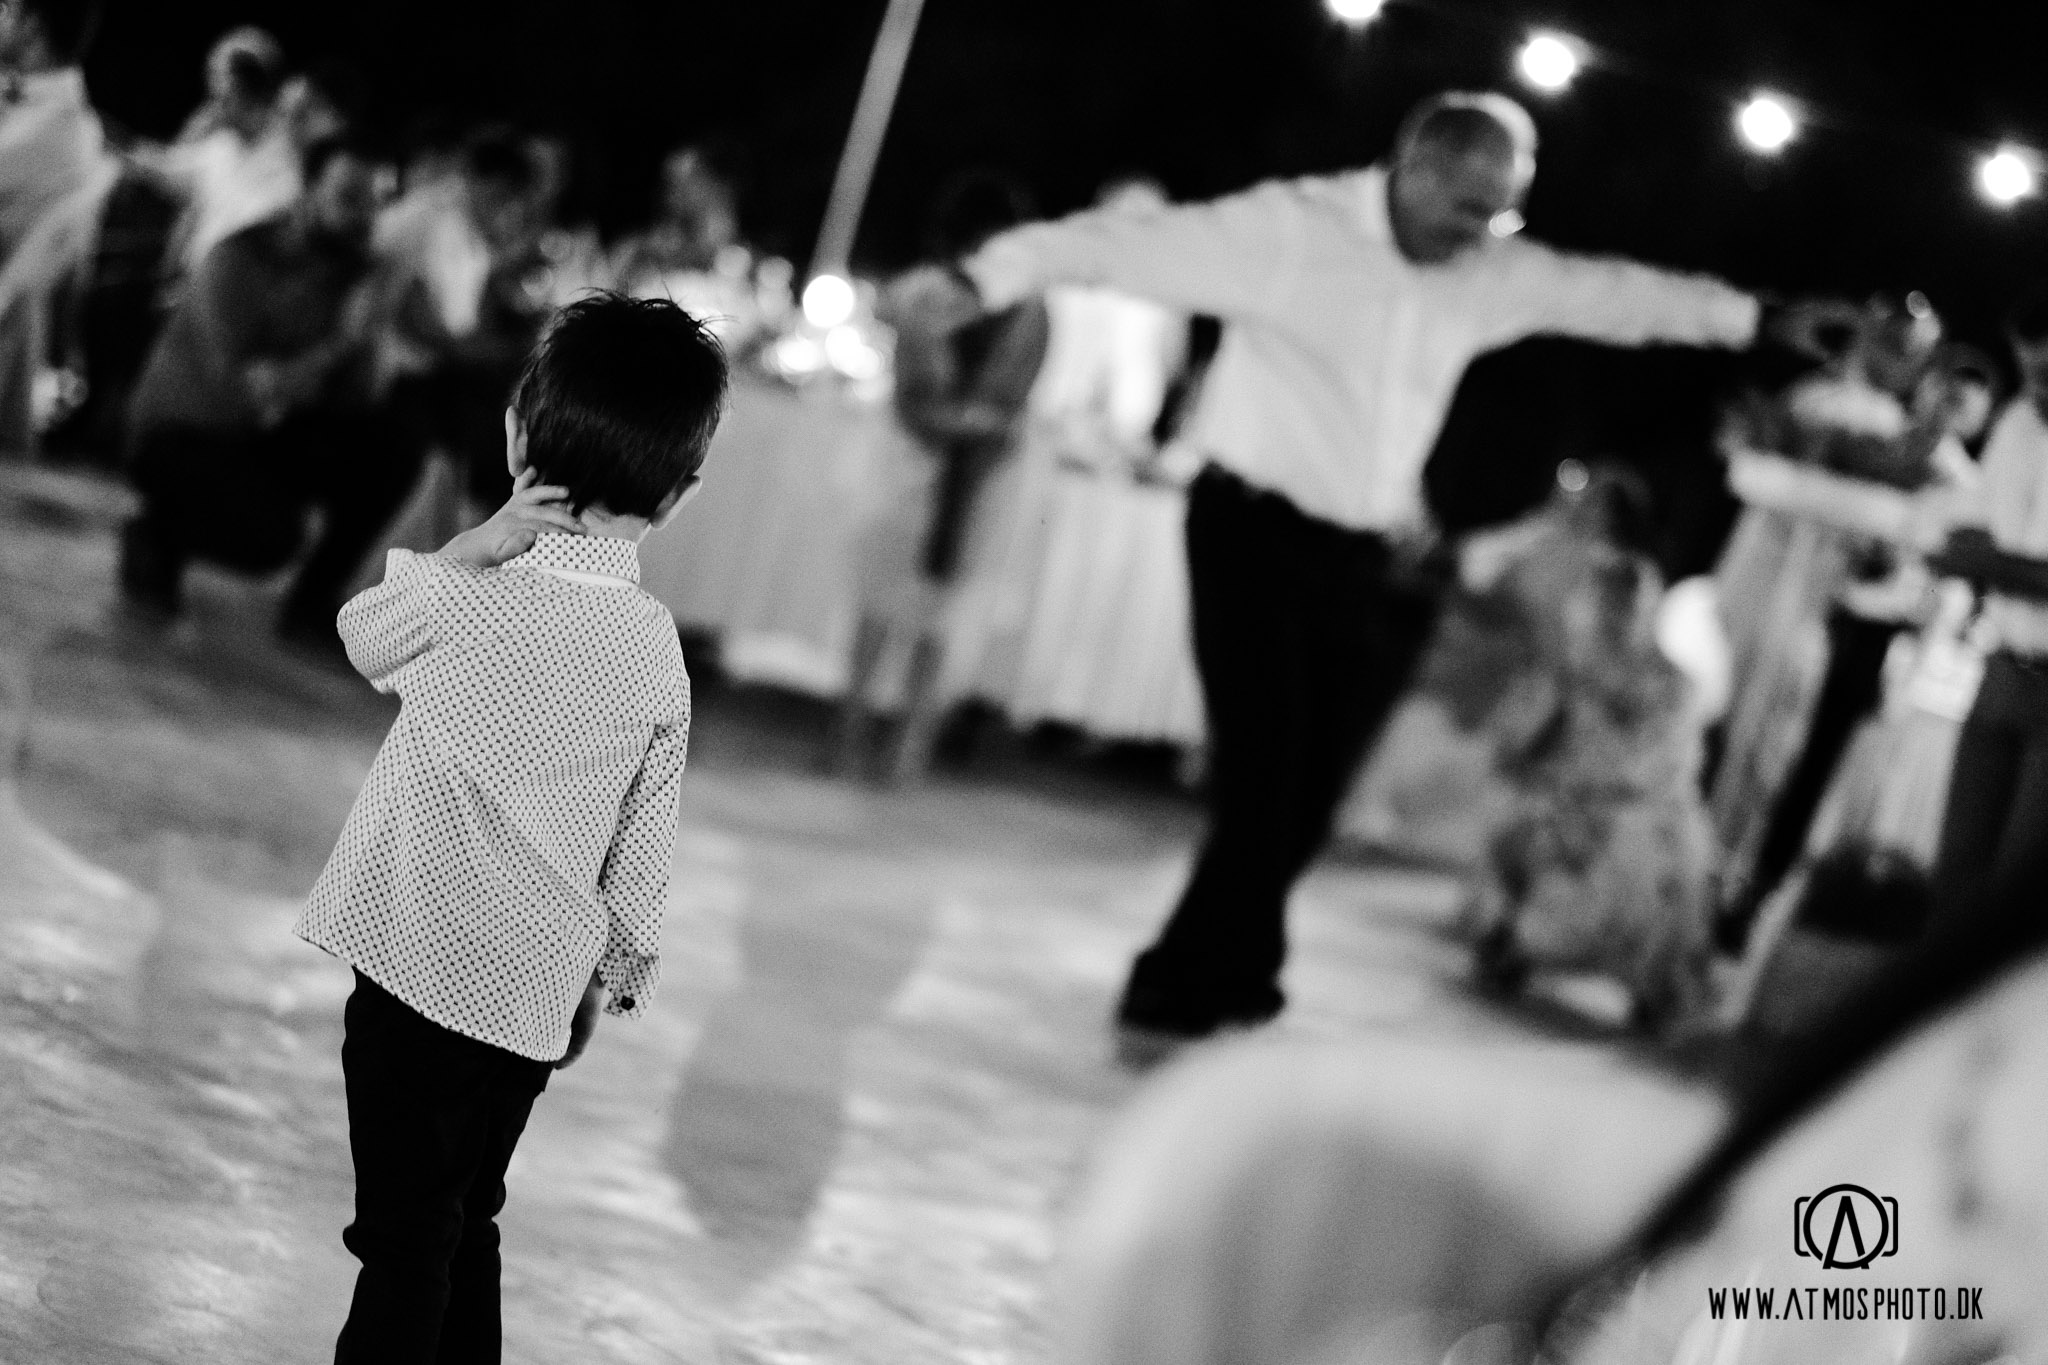 Wedding_AtmosPhoto_2048x-4-3.jpg